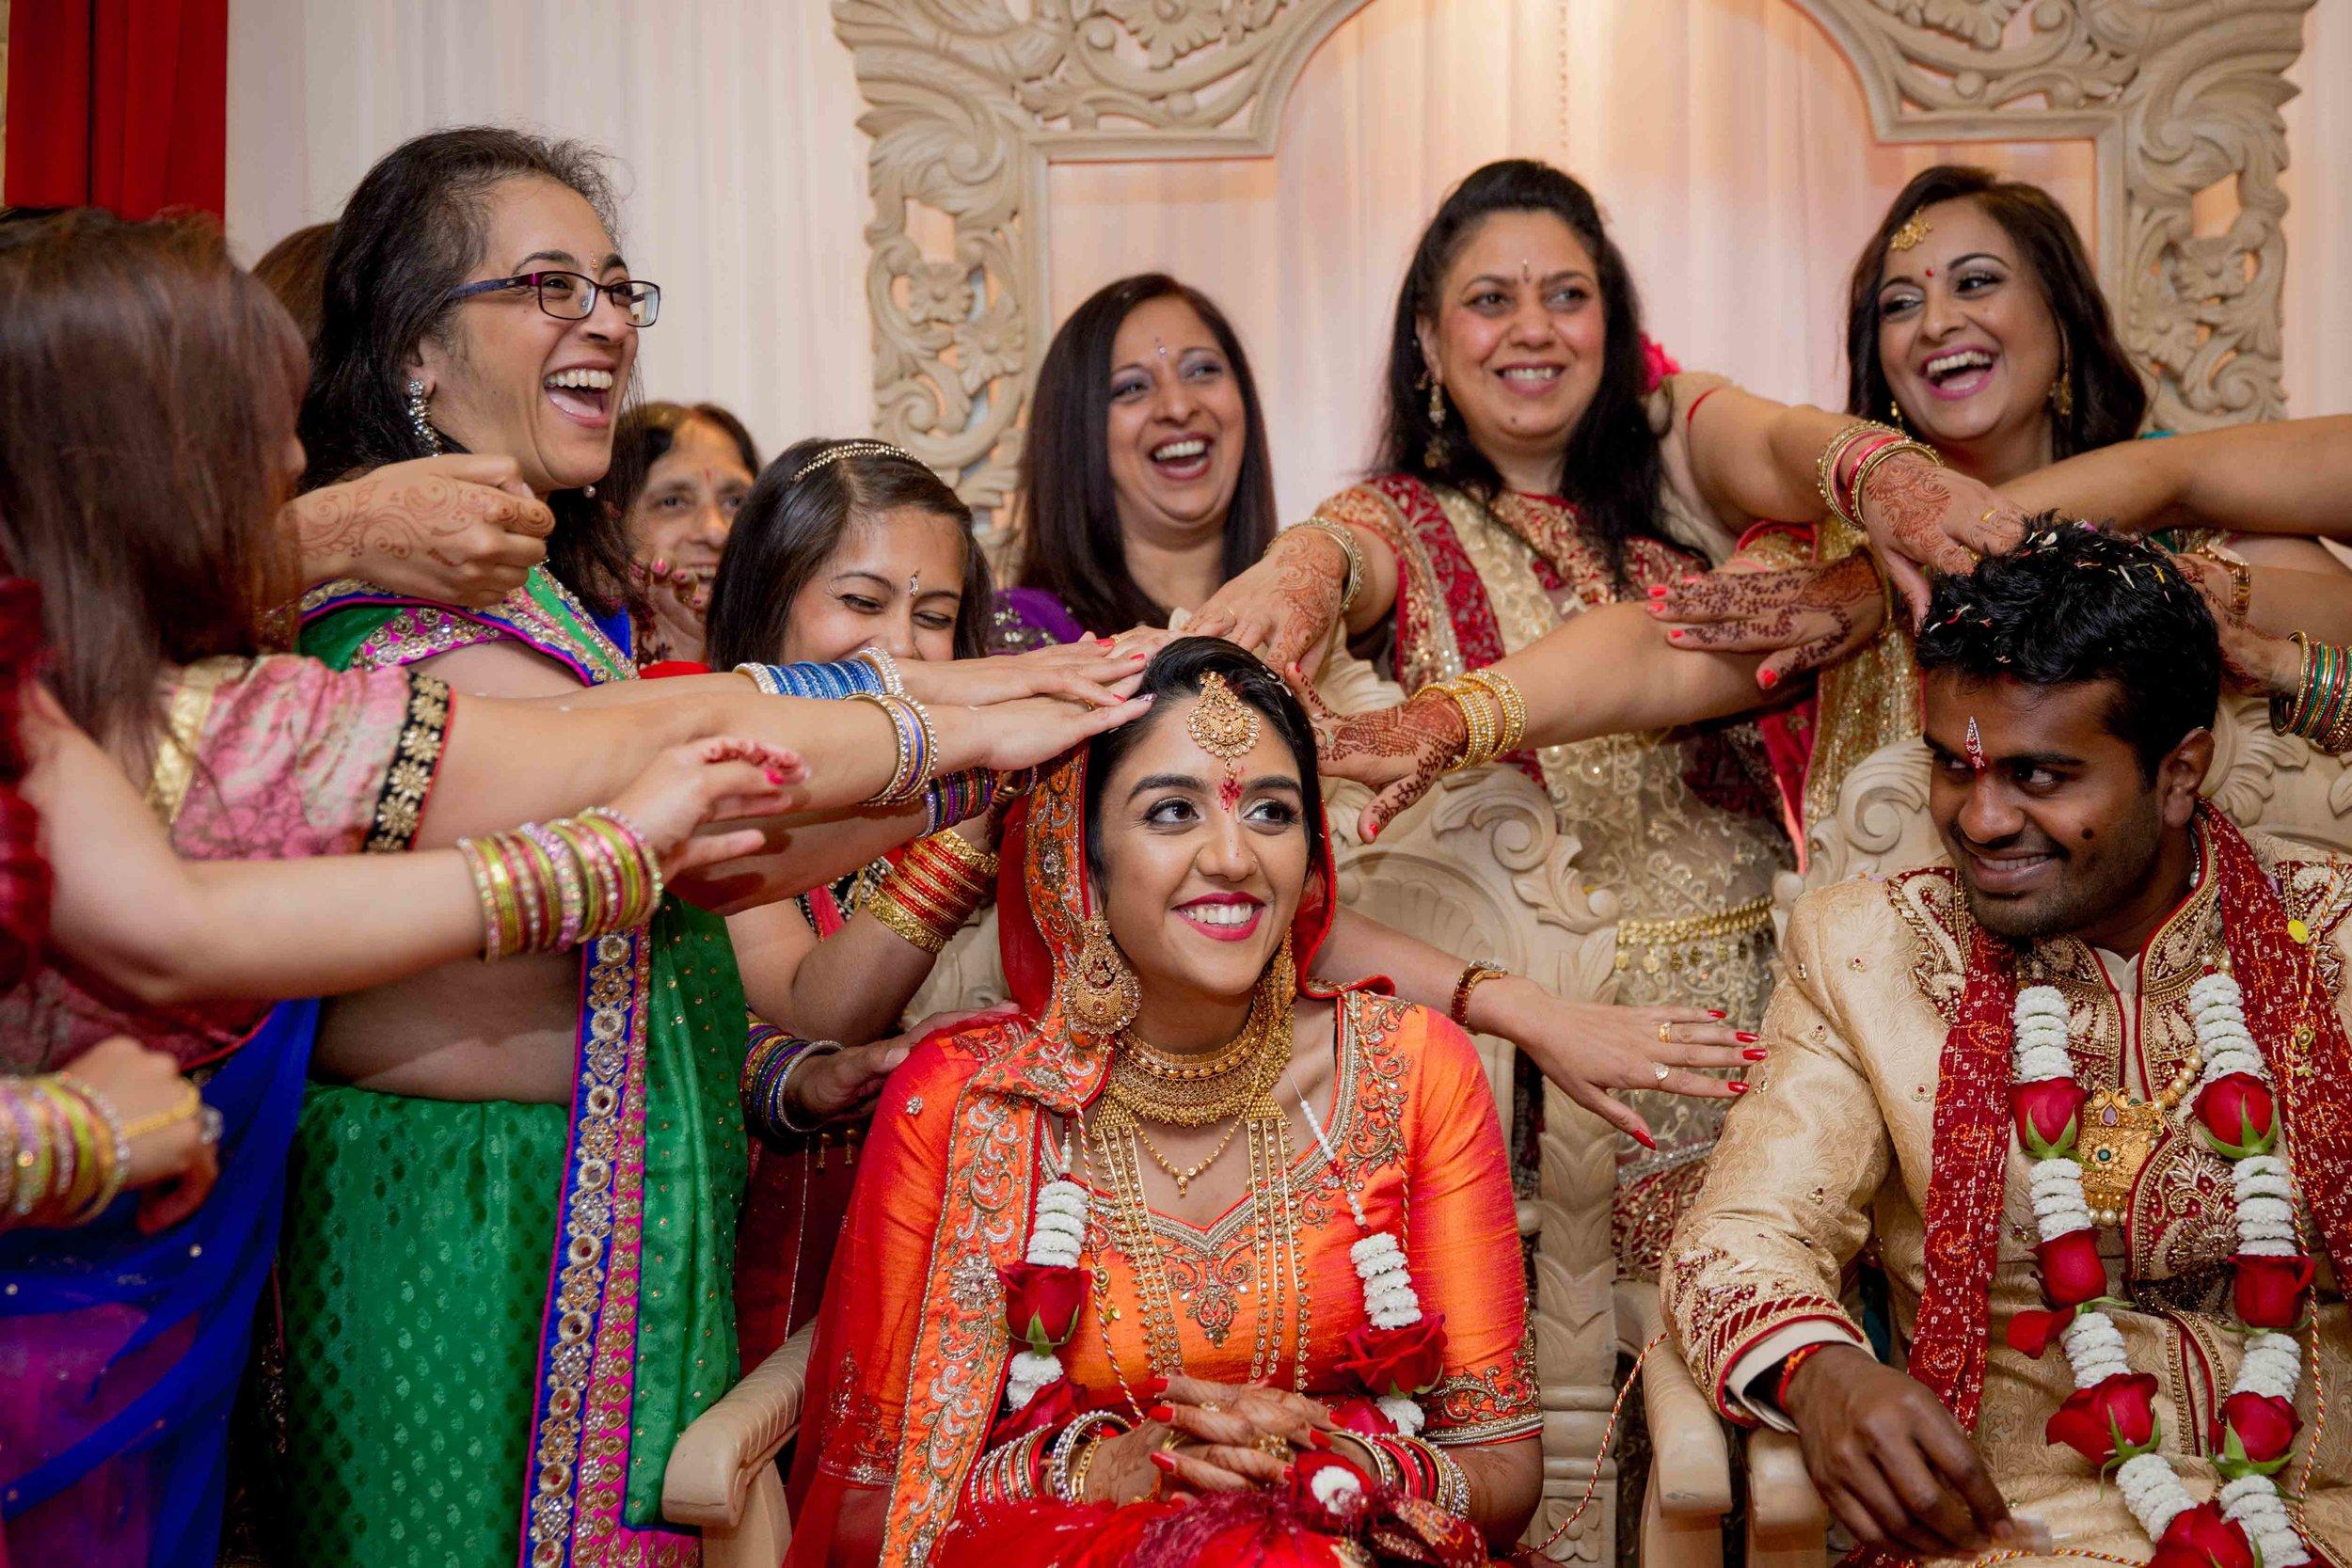 premier-banquetting-london-Hindu-asian-wedding-photographer-natalia-smith-photography-32.jpg